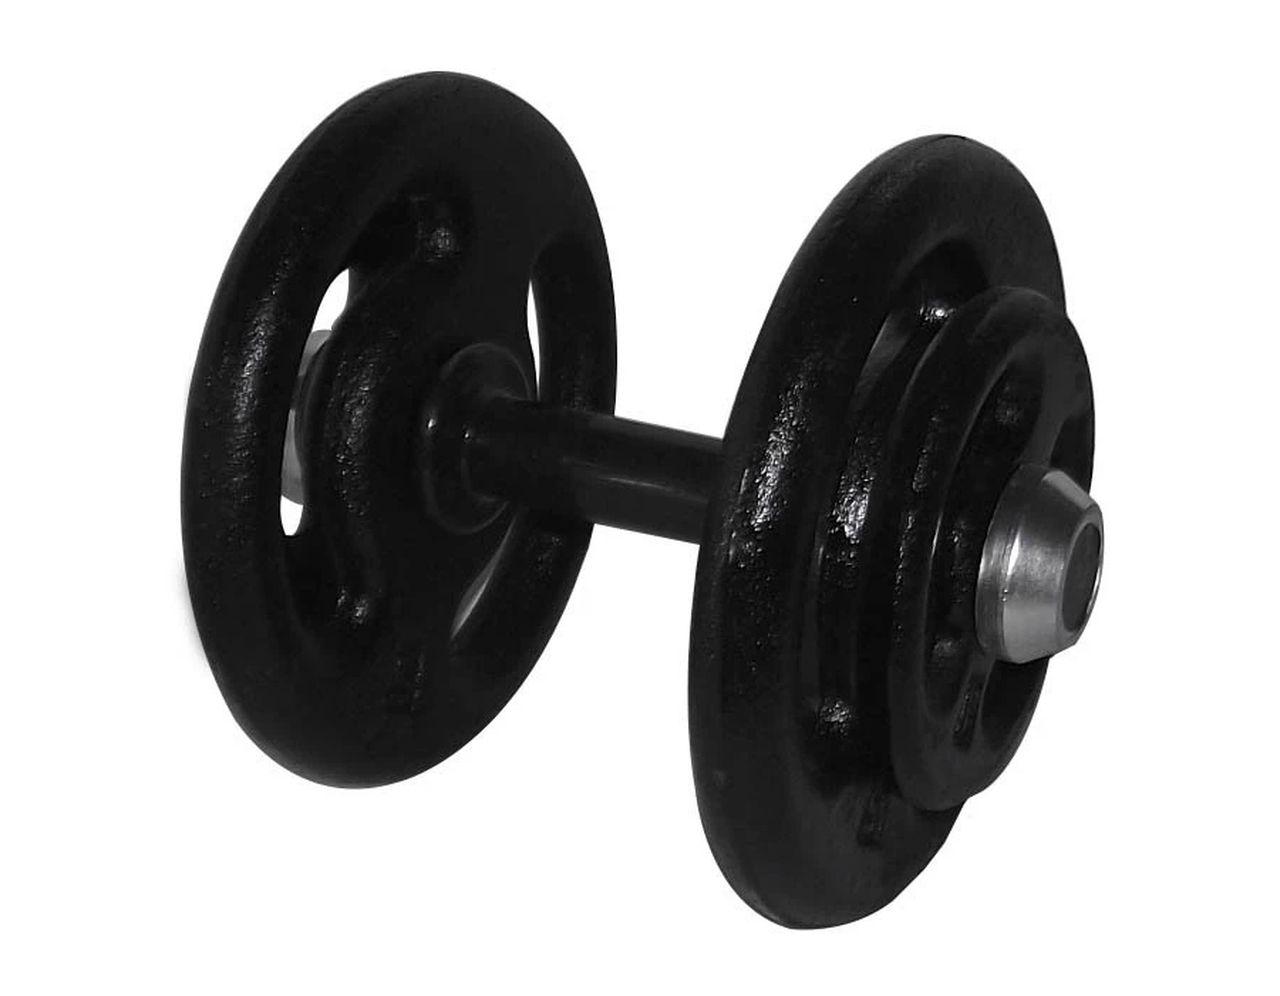 Dumbbell Pintado Pegada Emborrachada Academia Fitness 20kg  - Panela de Ferro Fundido